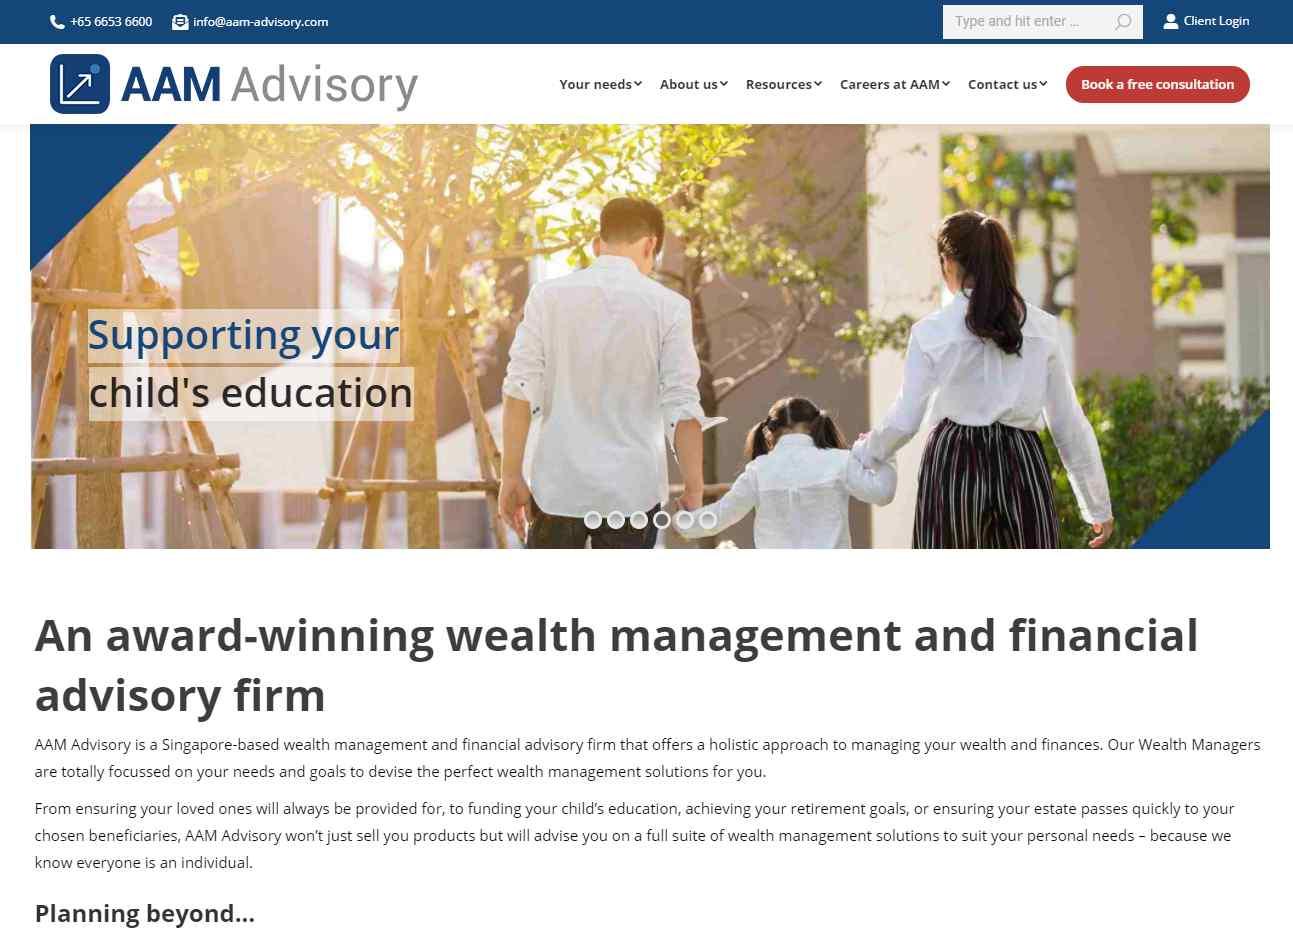 aam Advisory Top Financial Advisors in Singapore